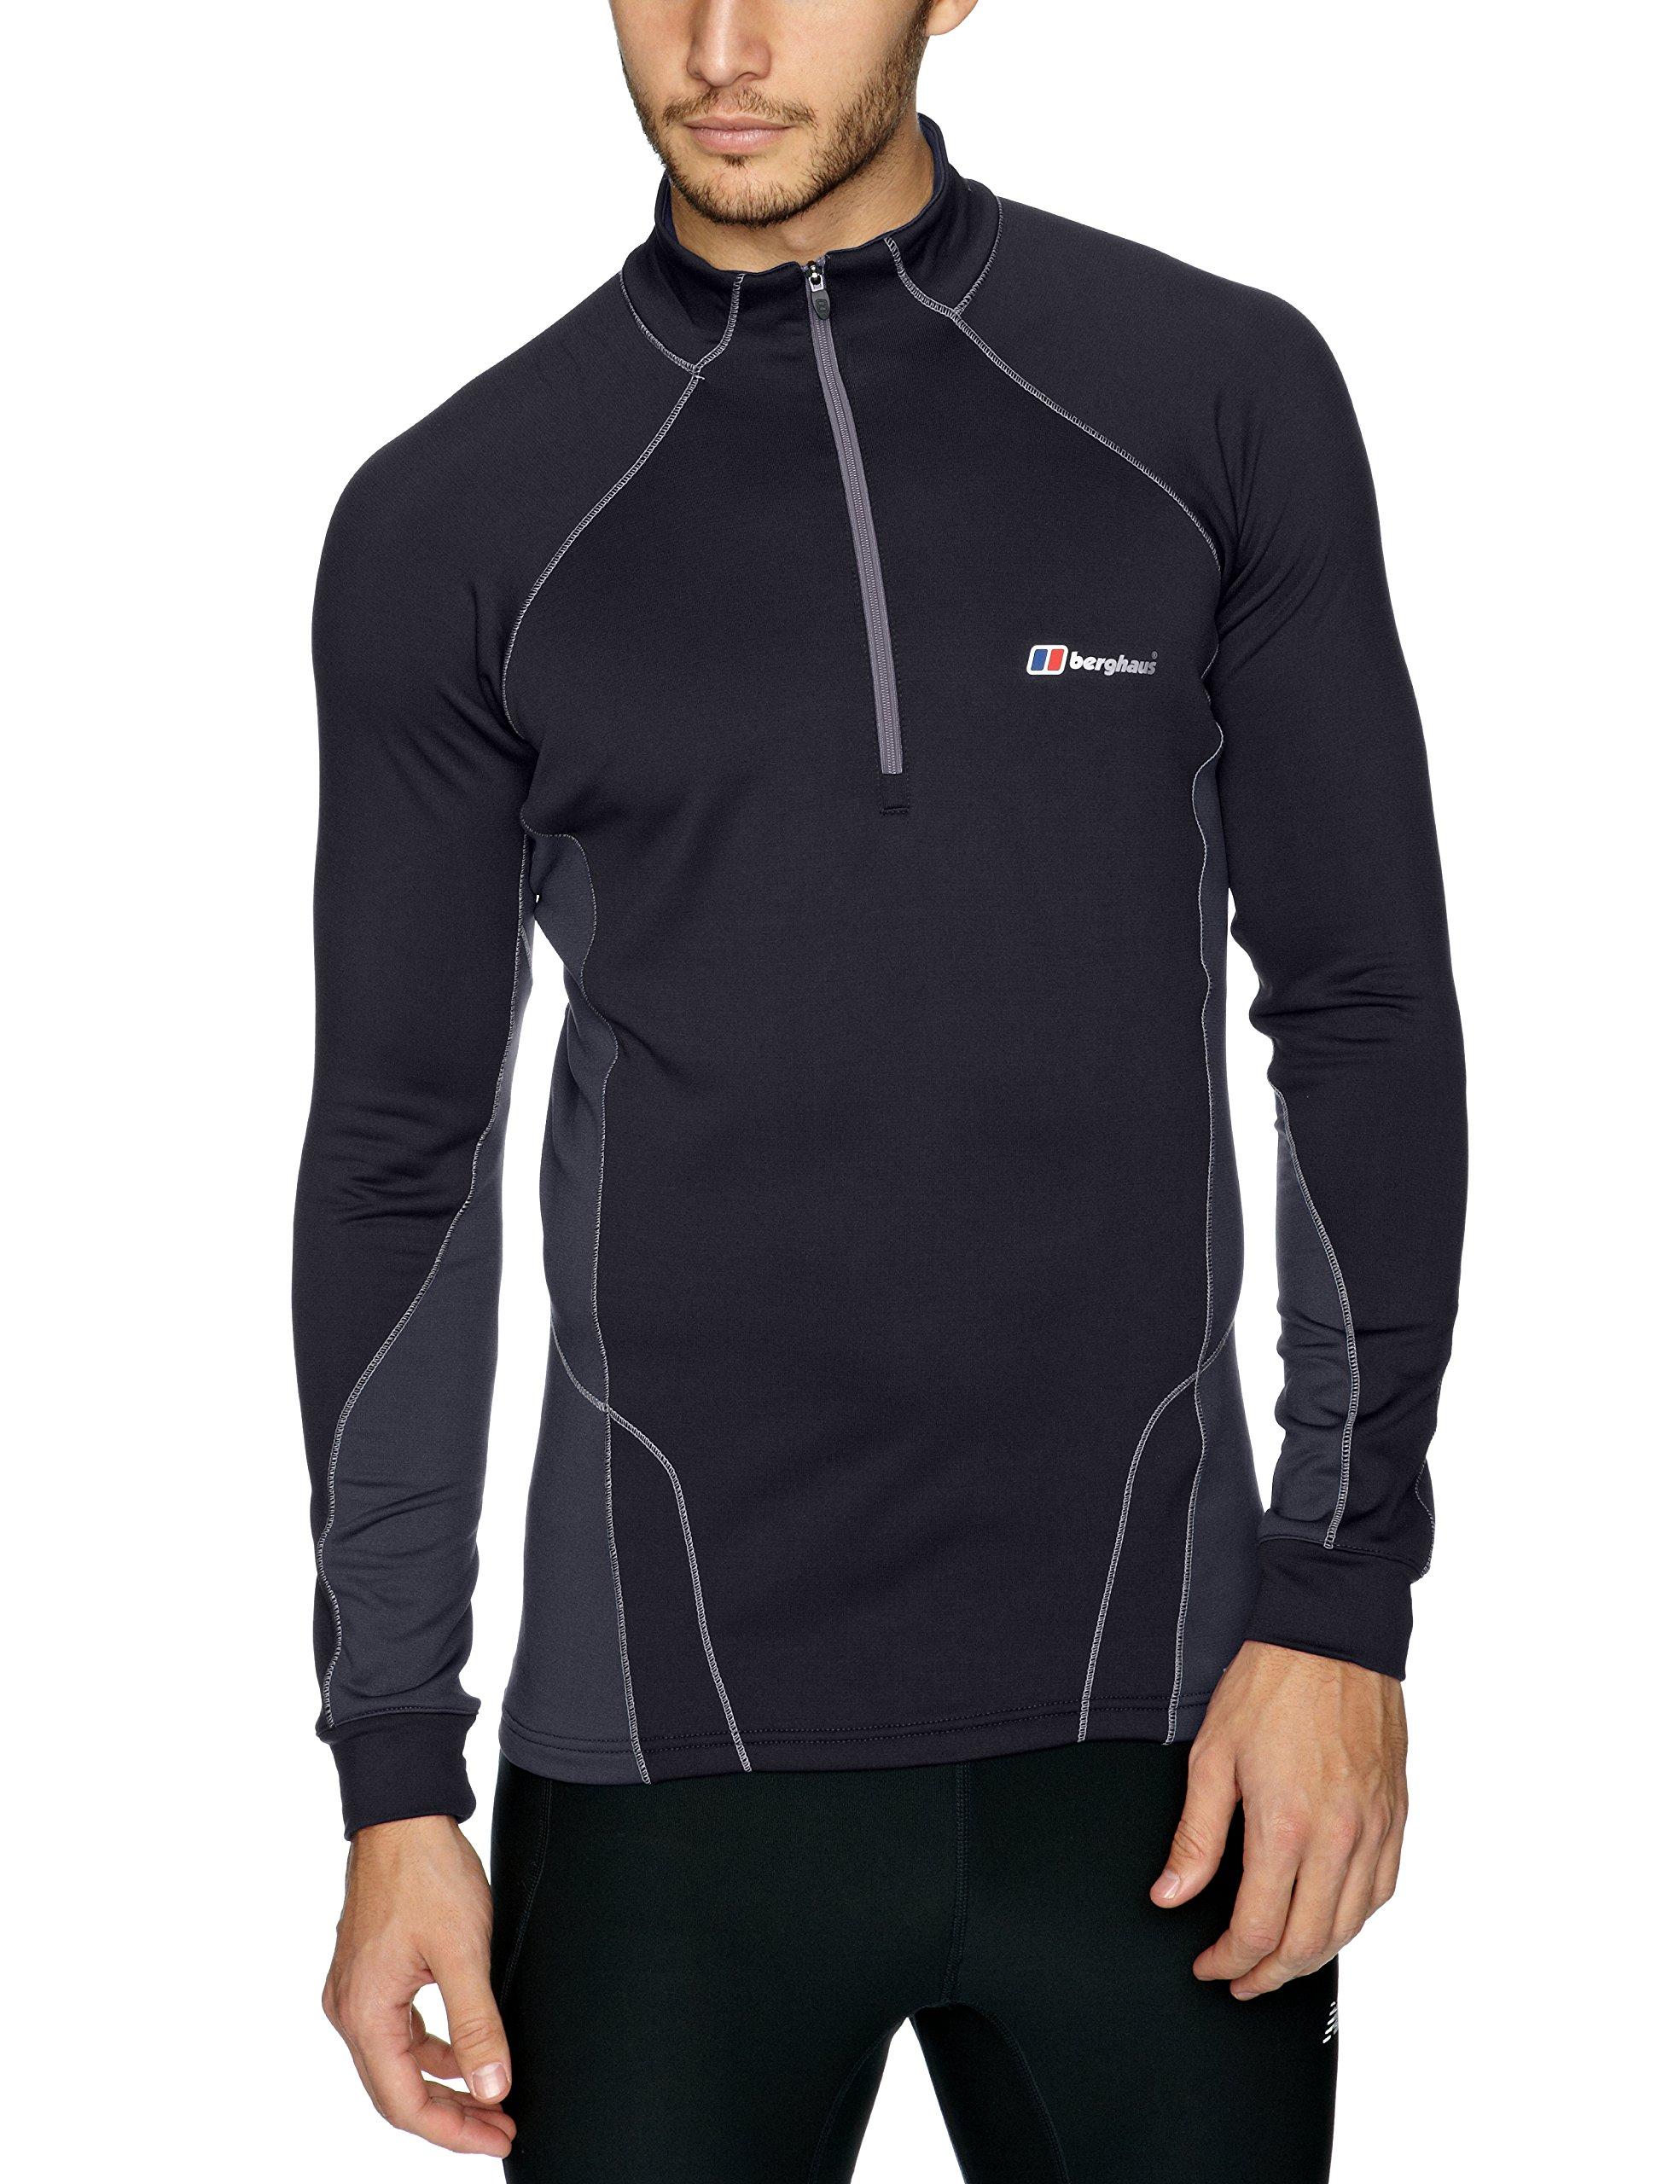 Berghaus men 39 s thermal zip neck t shirt black thunder for Mens black thermal t shirts